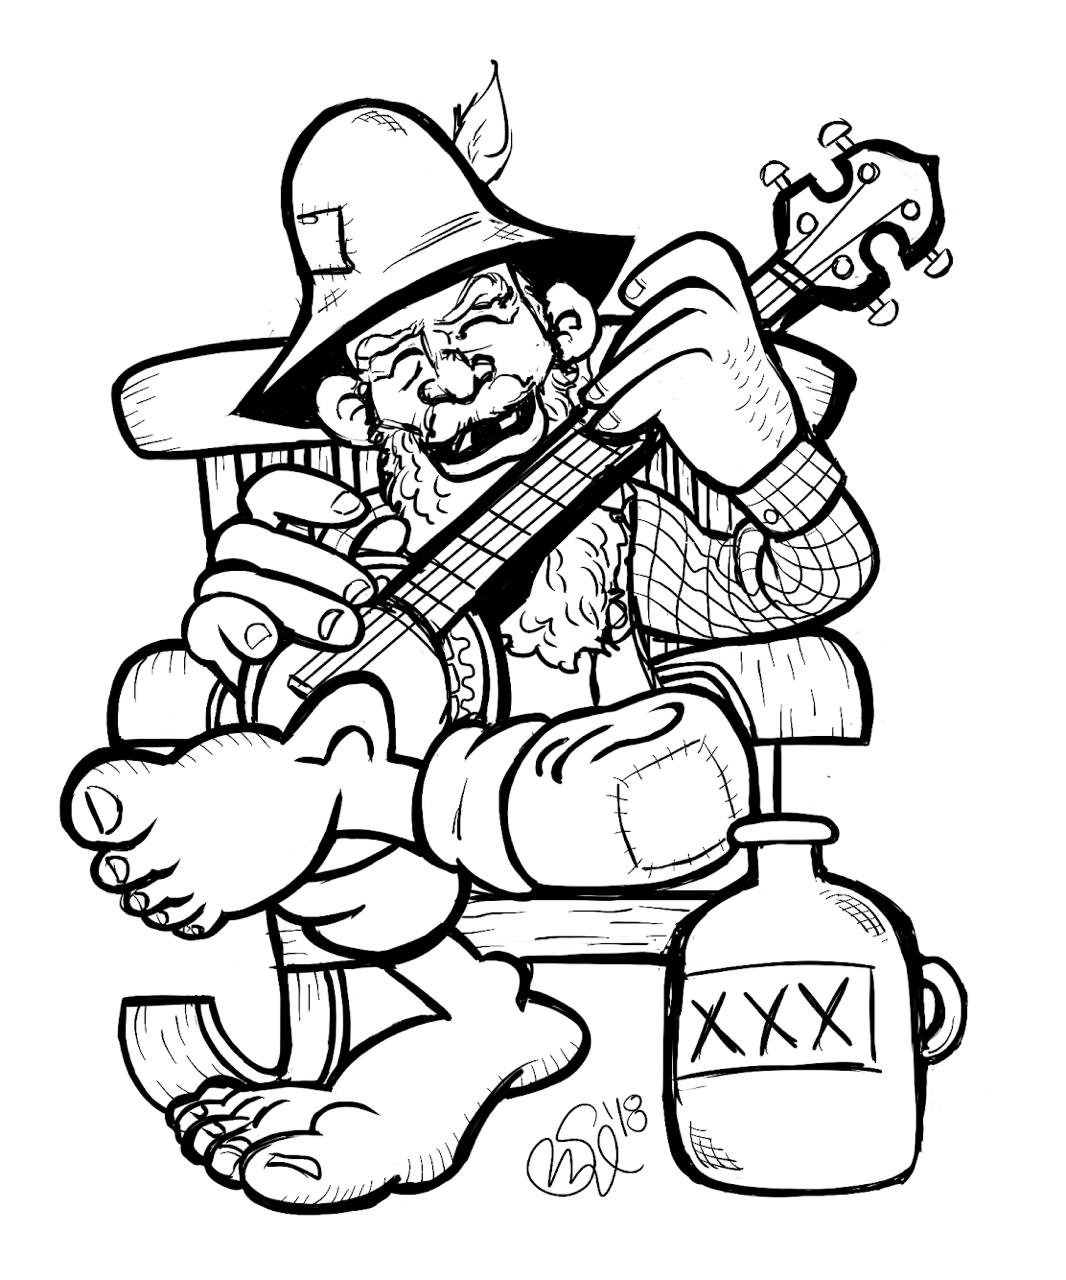 Happy Hillbilly By Ben Sanczel Cartoonist Hillbilly